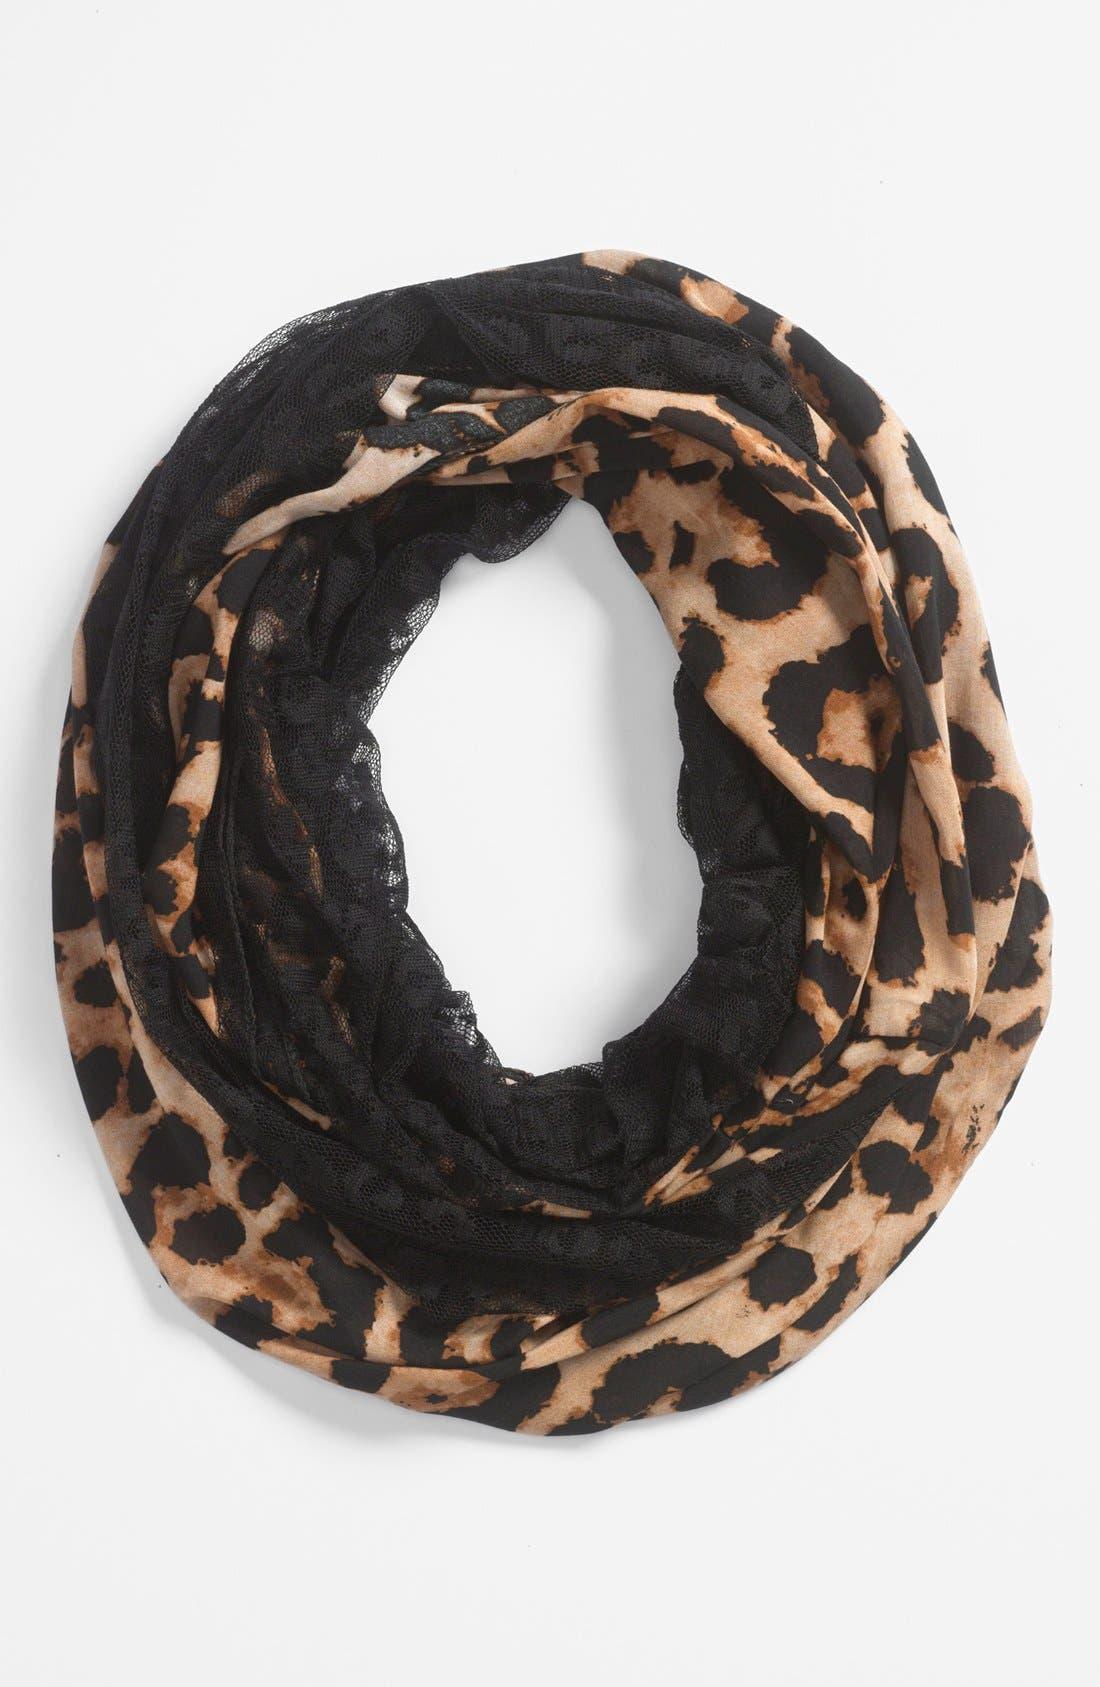 Animal Print & Lace Infinity Scarf,                             Main thumbnail 1, color,                             Black/ Camel